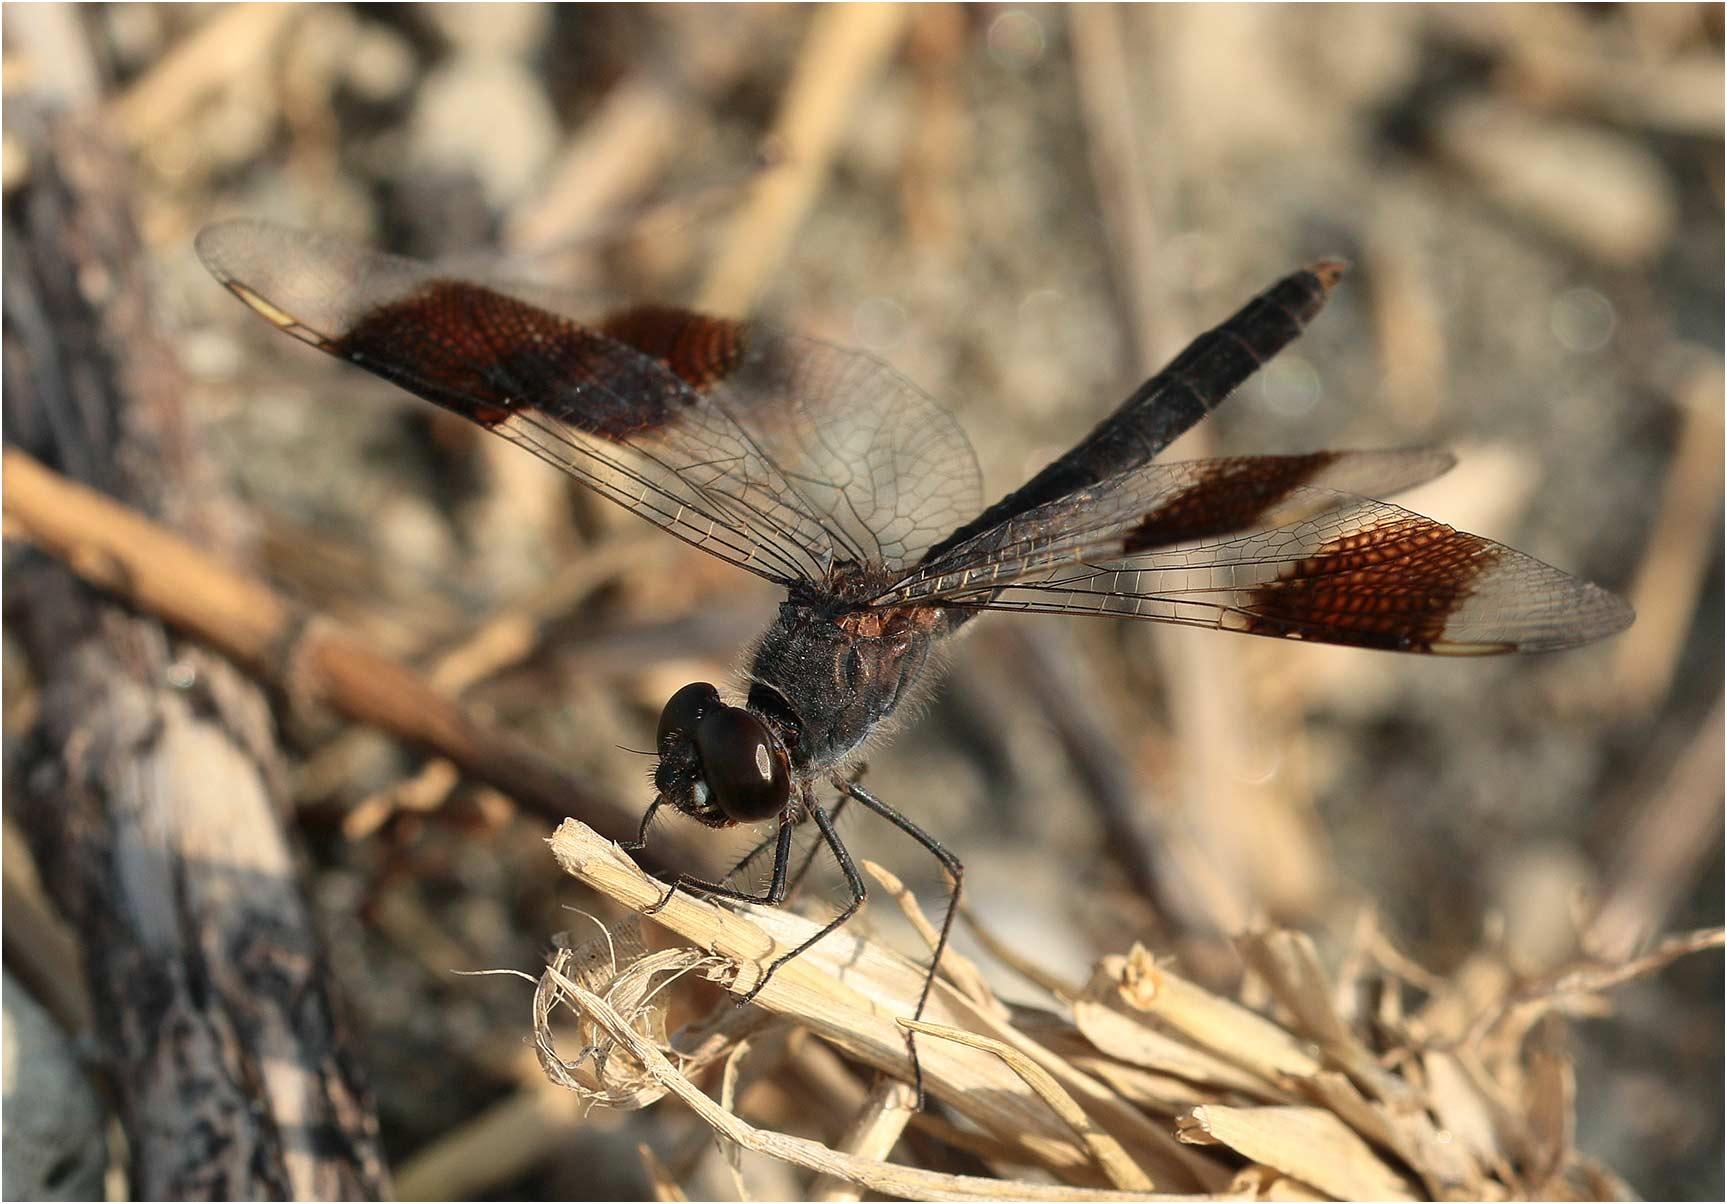 Brachythemis leucosticta mâle, Ethiopie, lac Langano, 31/10/2018